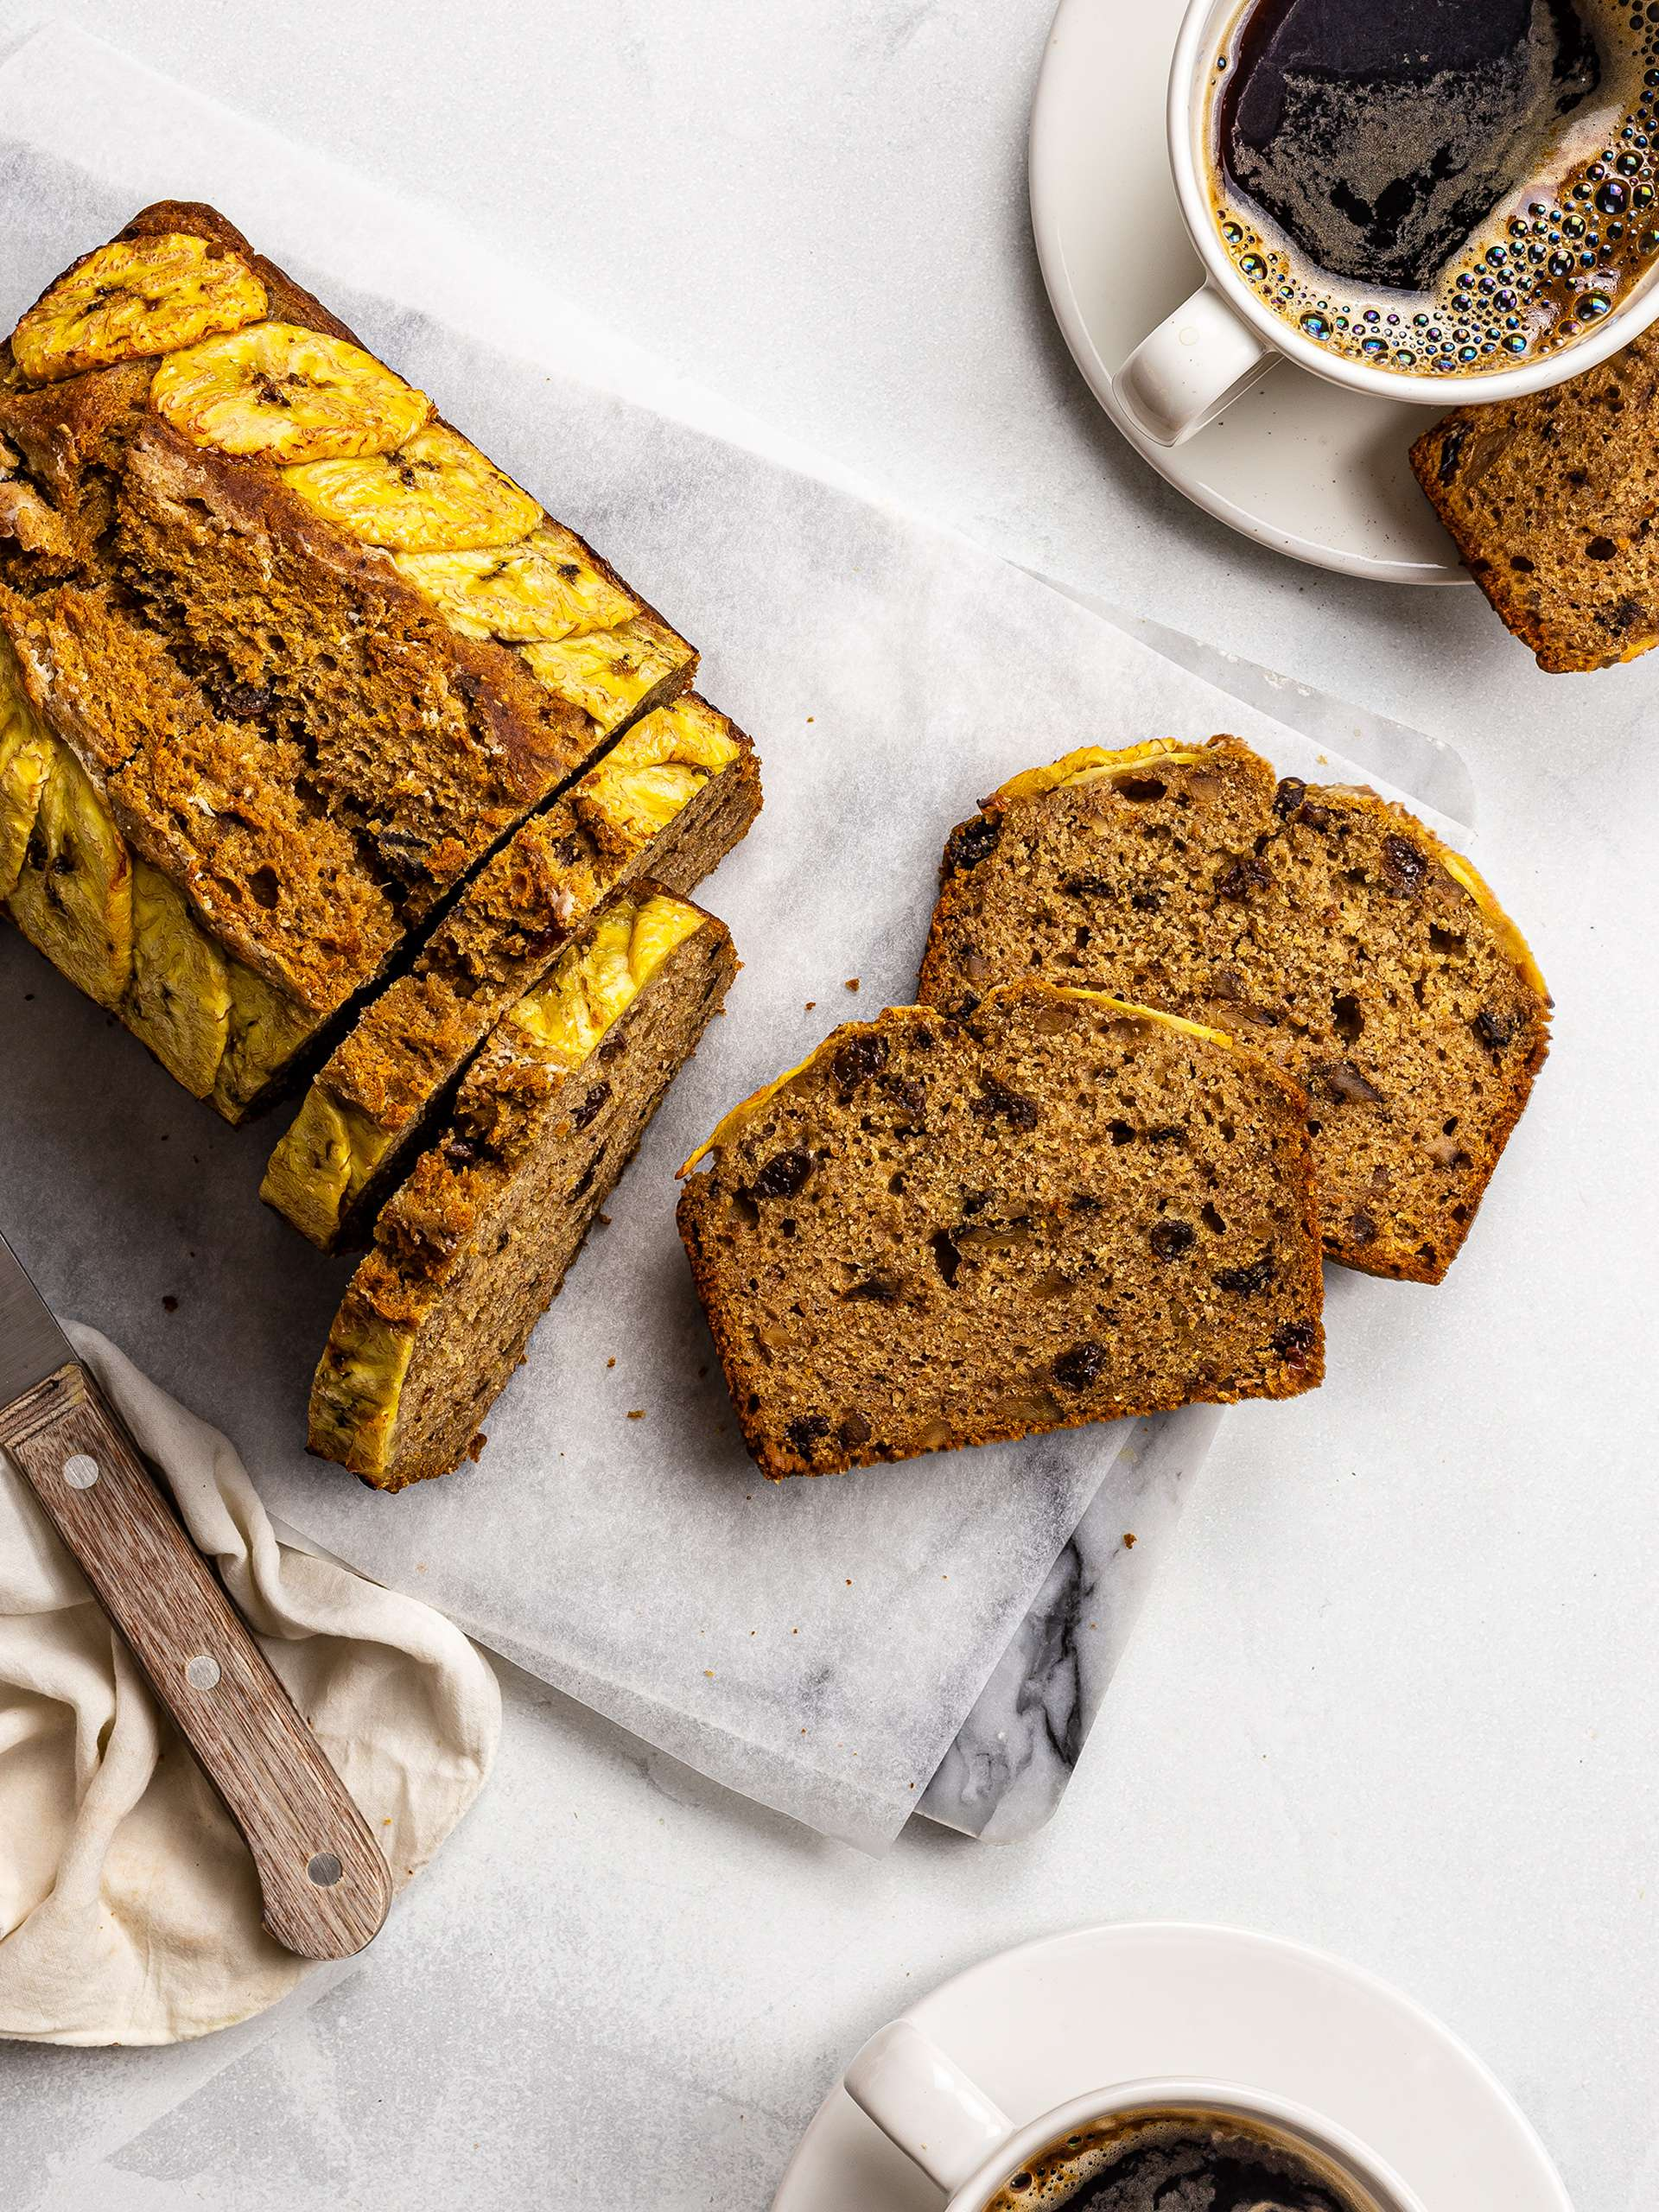 Vegan Plantain Bread with Walnuts and Raisins